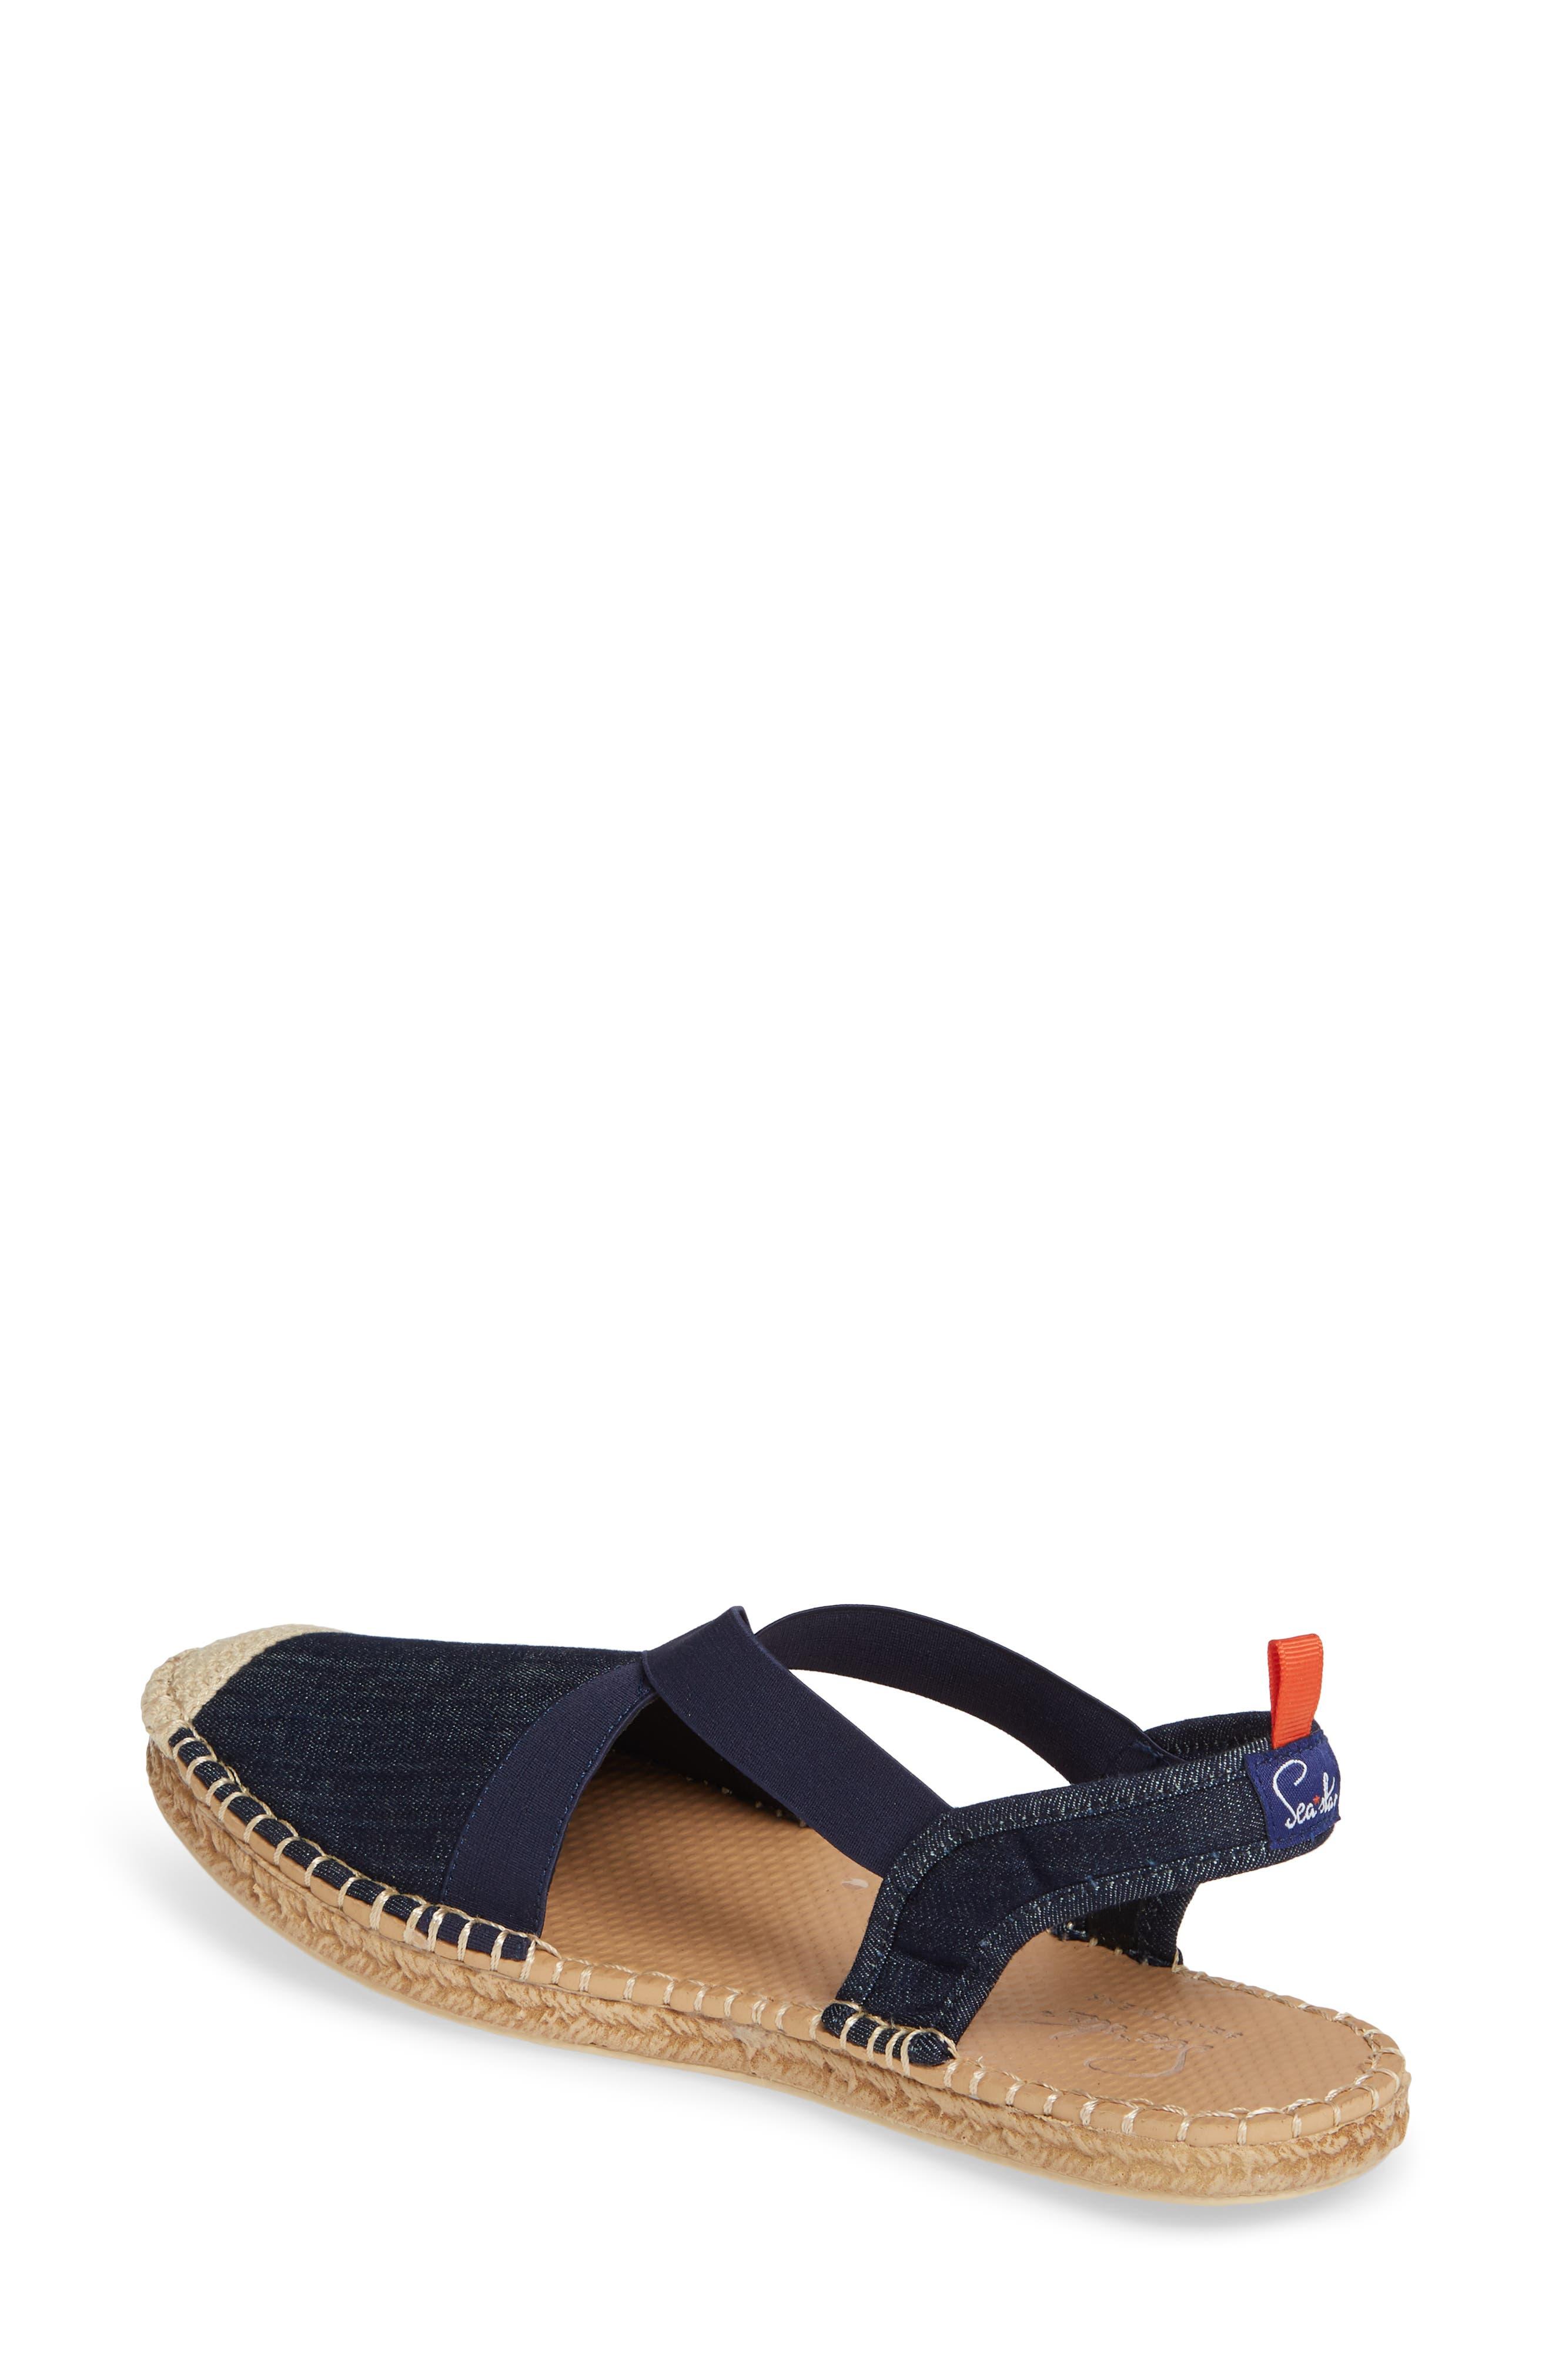 fdb4b0063 Women s Sea Star Beachwear Shoes